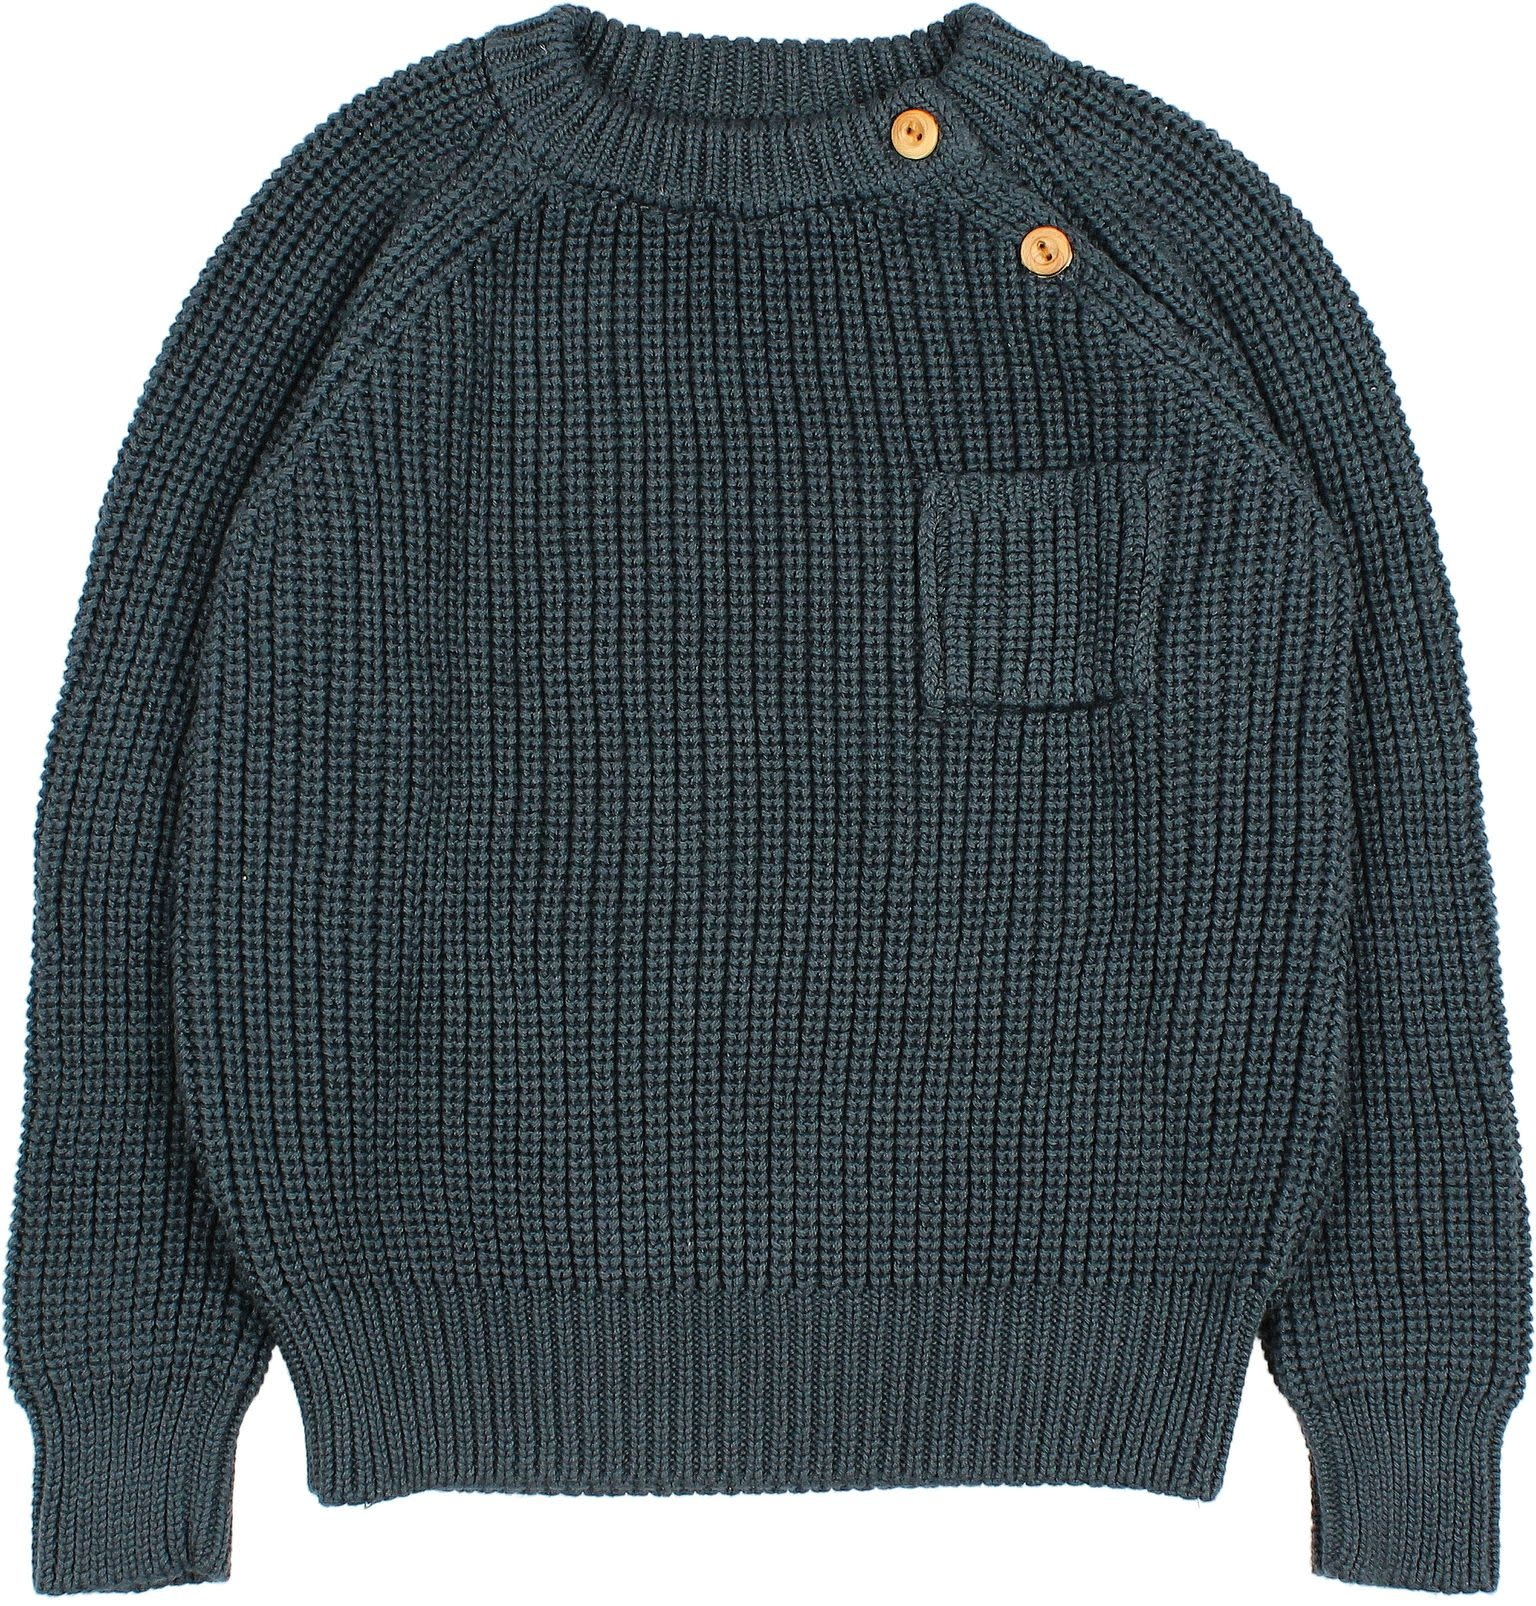 Buho Buho - 9183 Pocket knit jumper Blue night